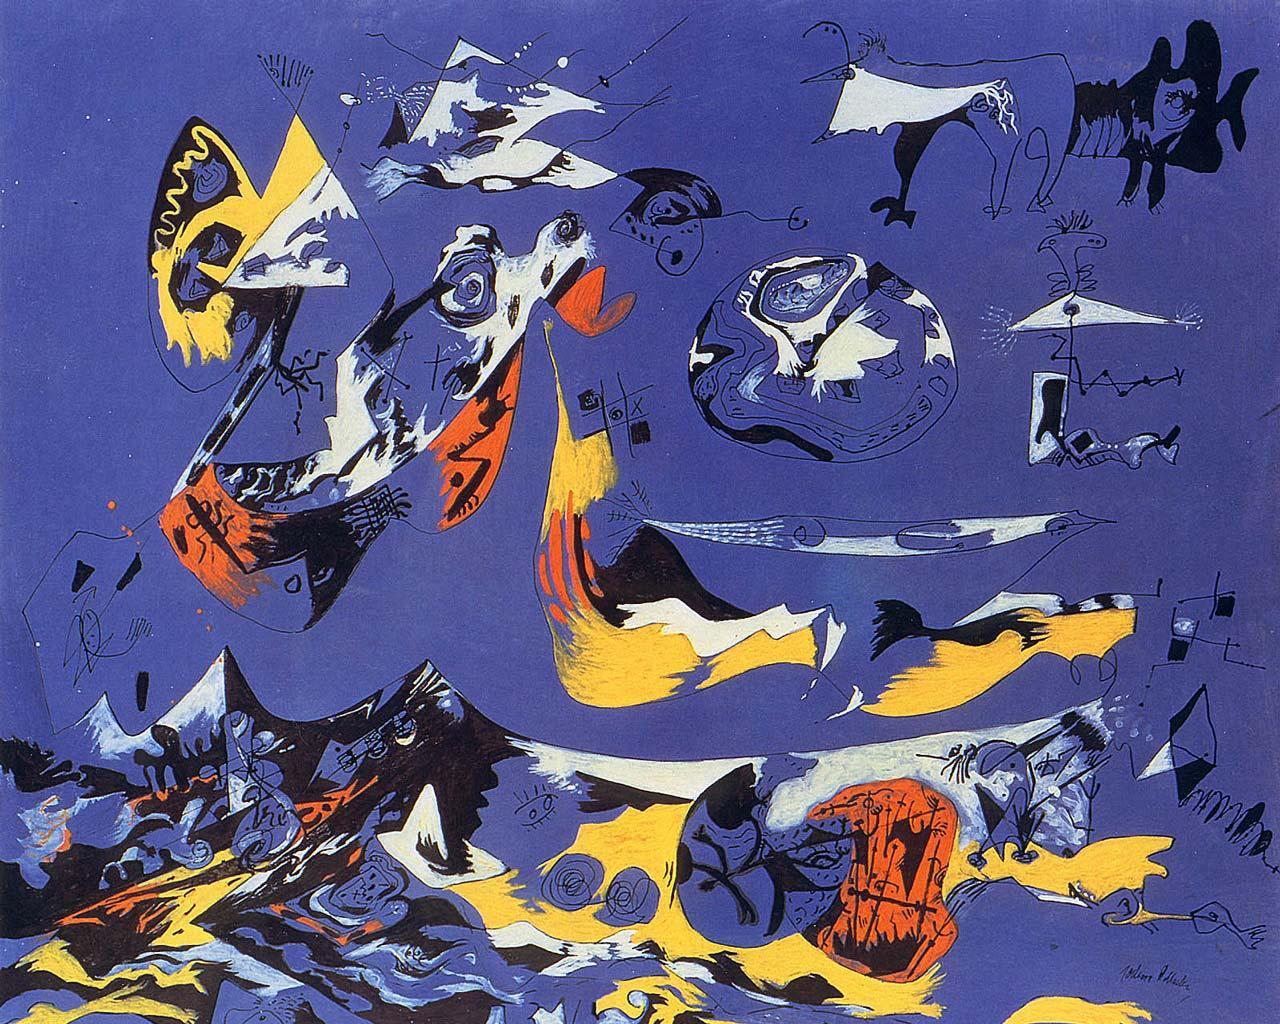 Jackson Pollock  Portrait and a Dream 1953  Artsy